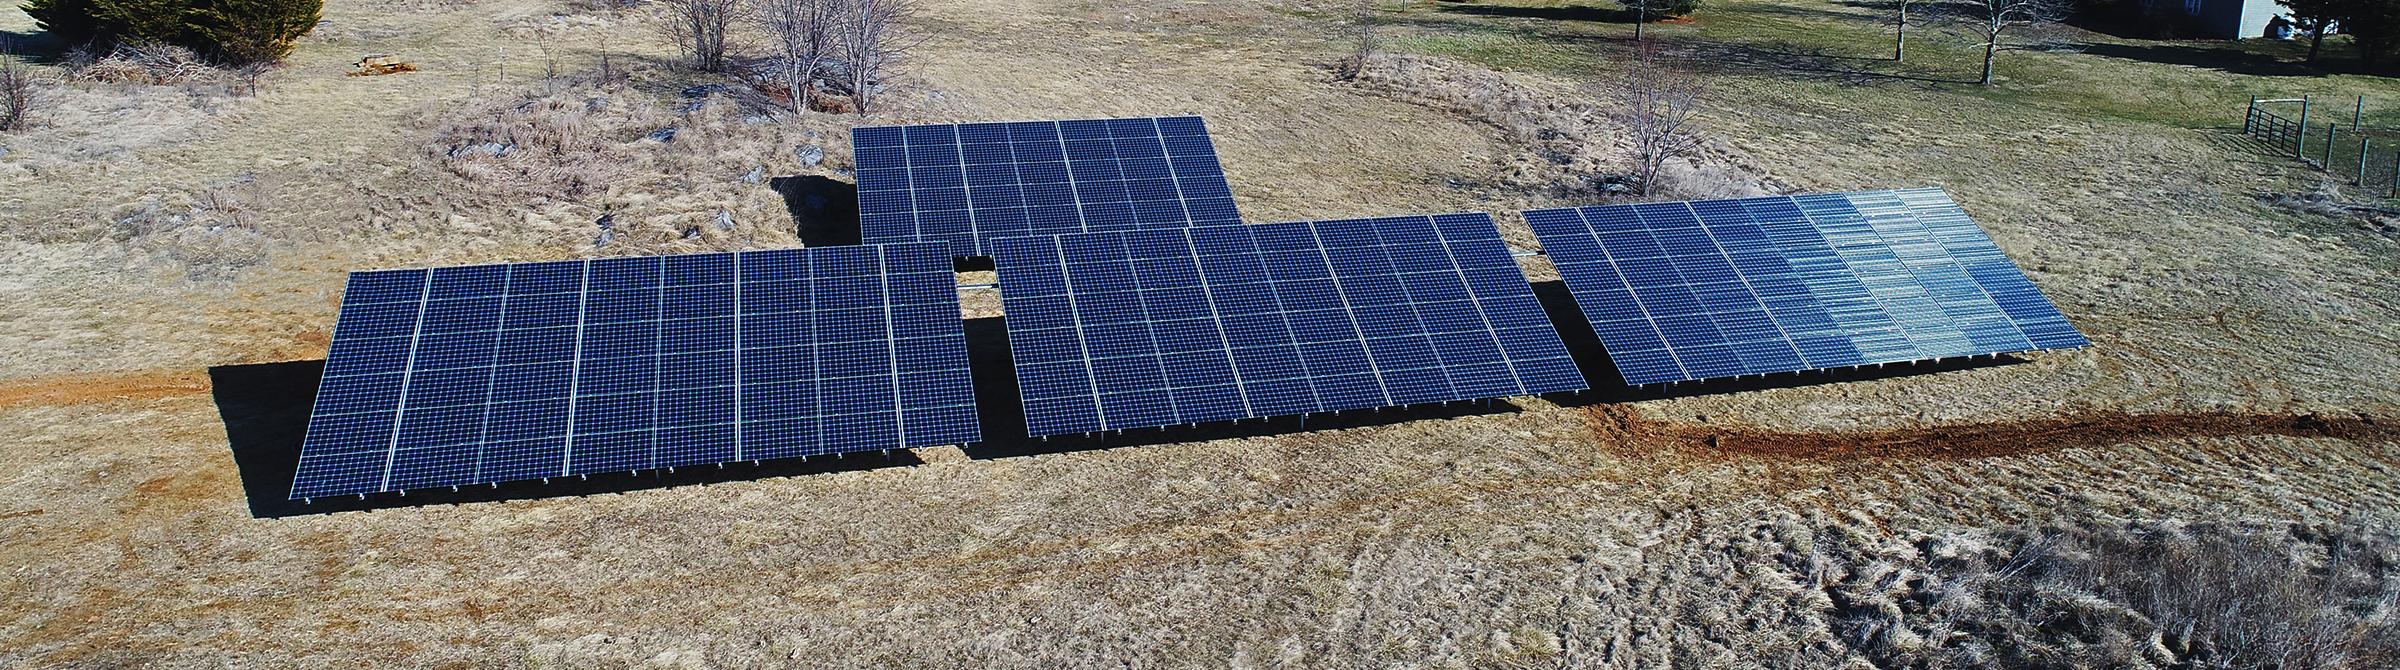 Solar Foundations USA - Solar Foundations USA